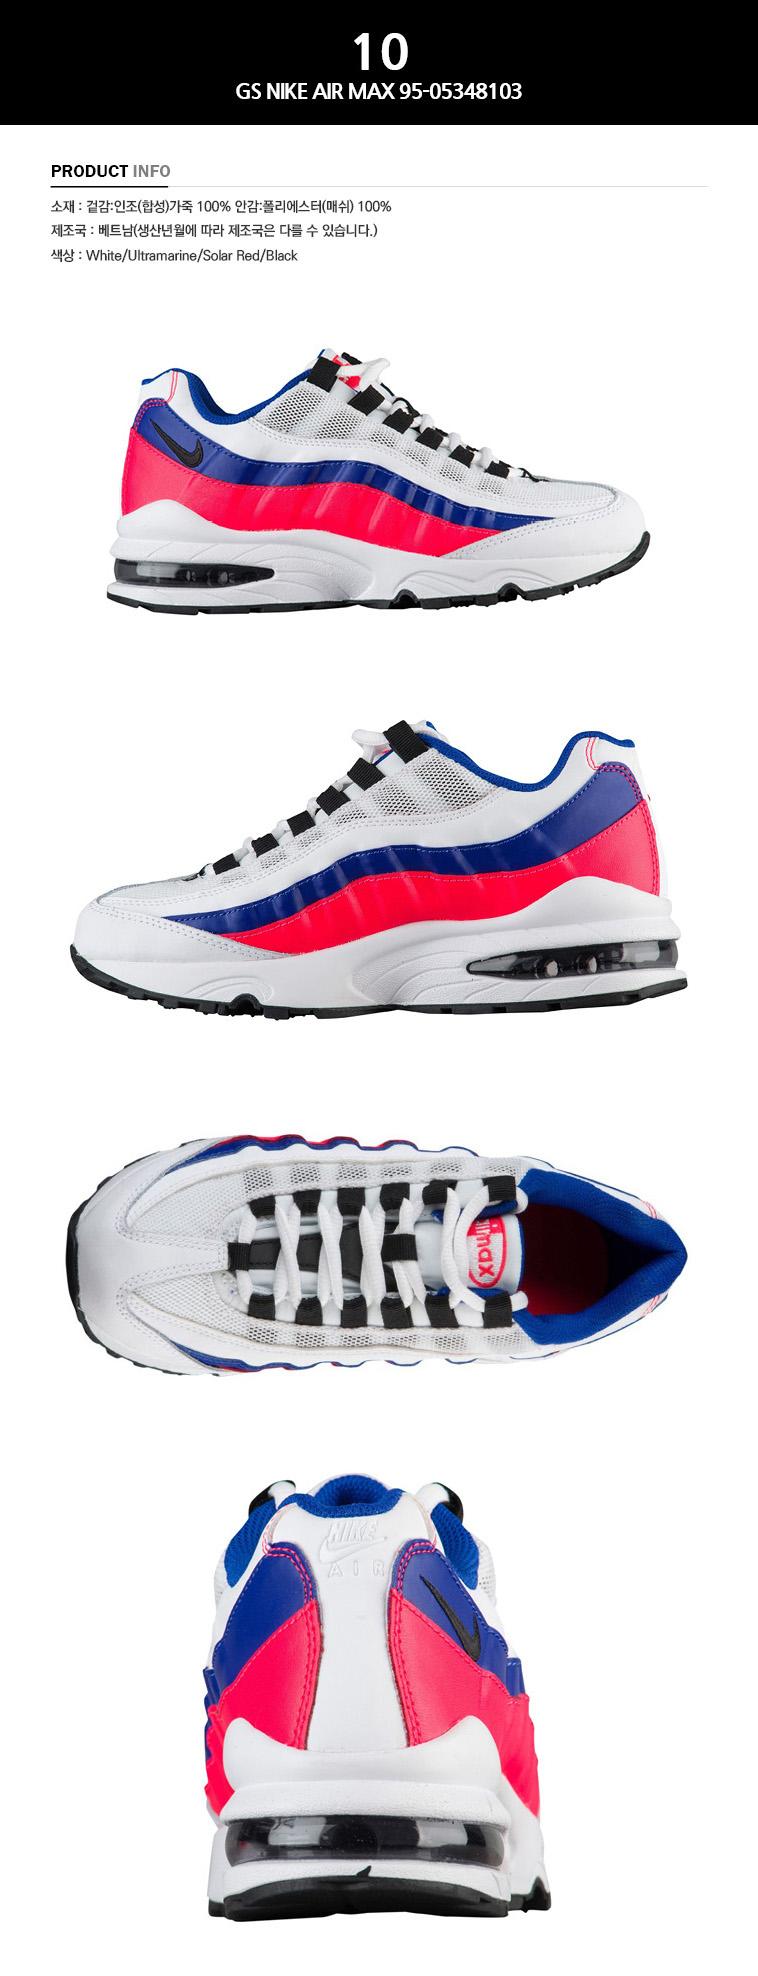 q7981100 cheap nike shoes online